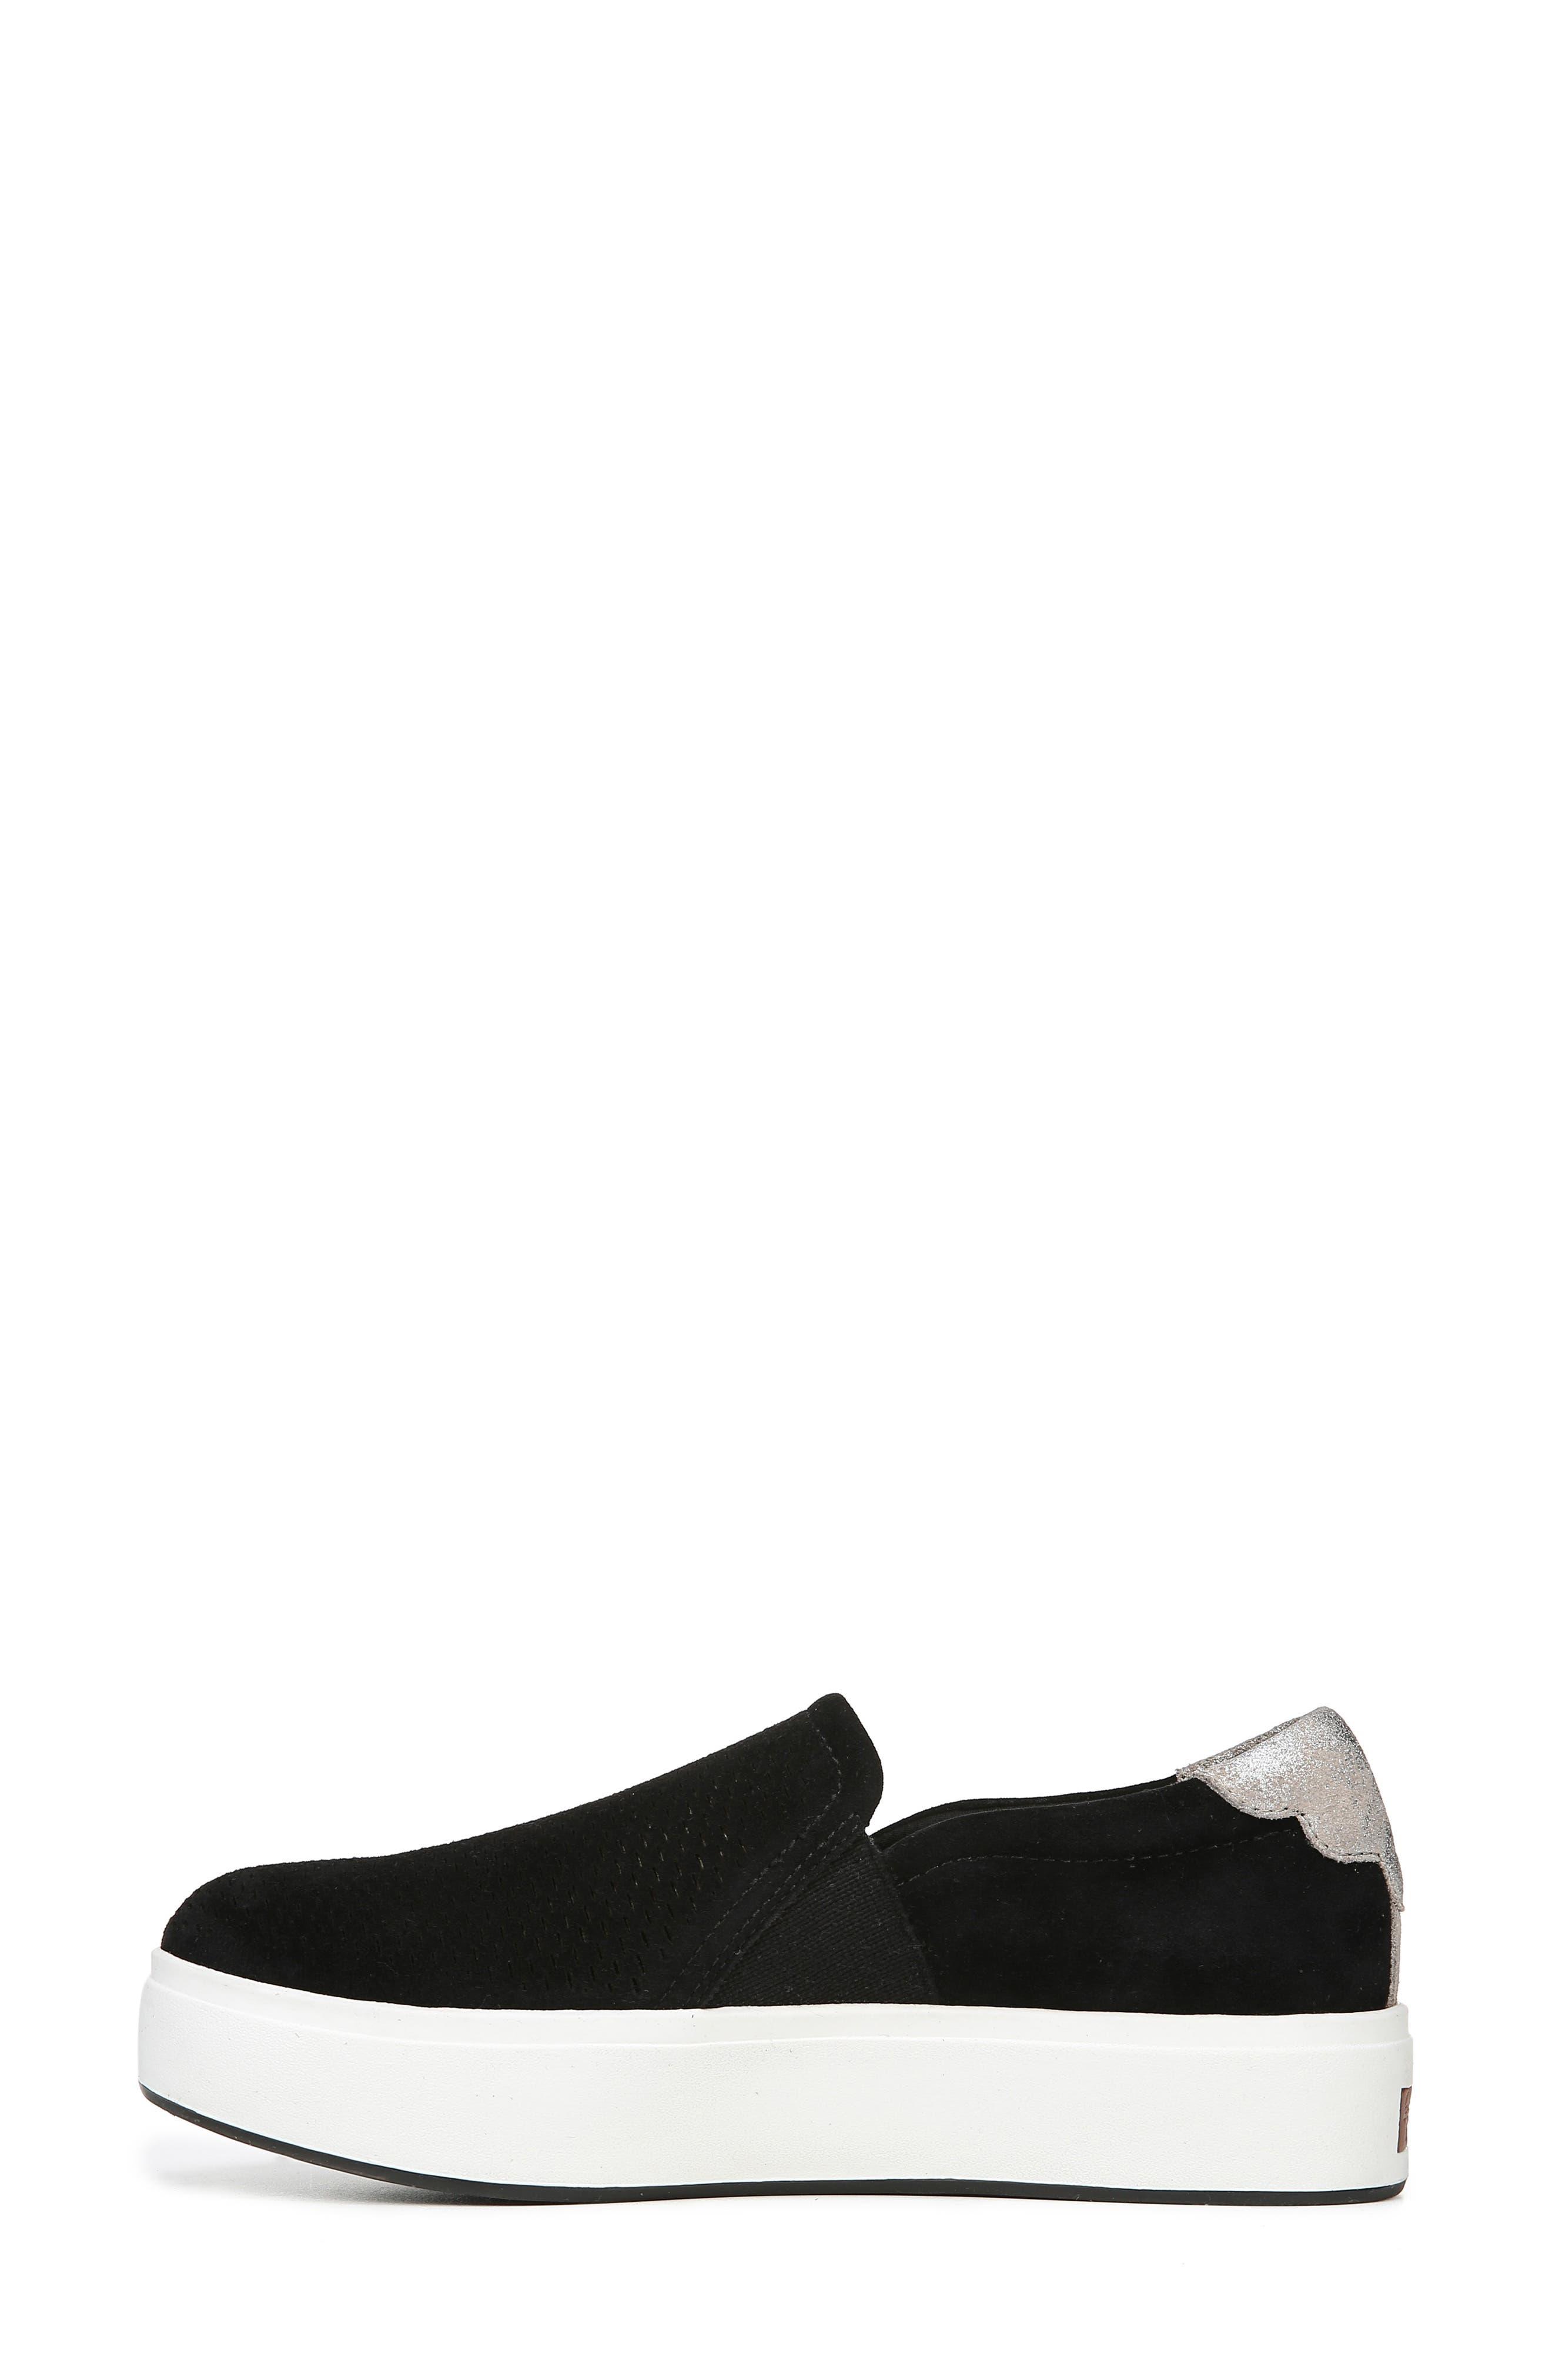 Abbot Lux Sneaker,                             Alternate thumbnail 8, color,                             BLACK SUEDE